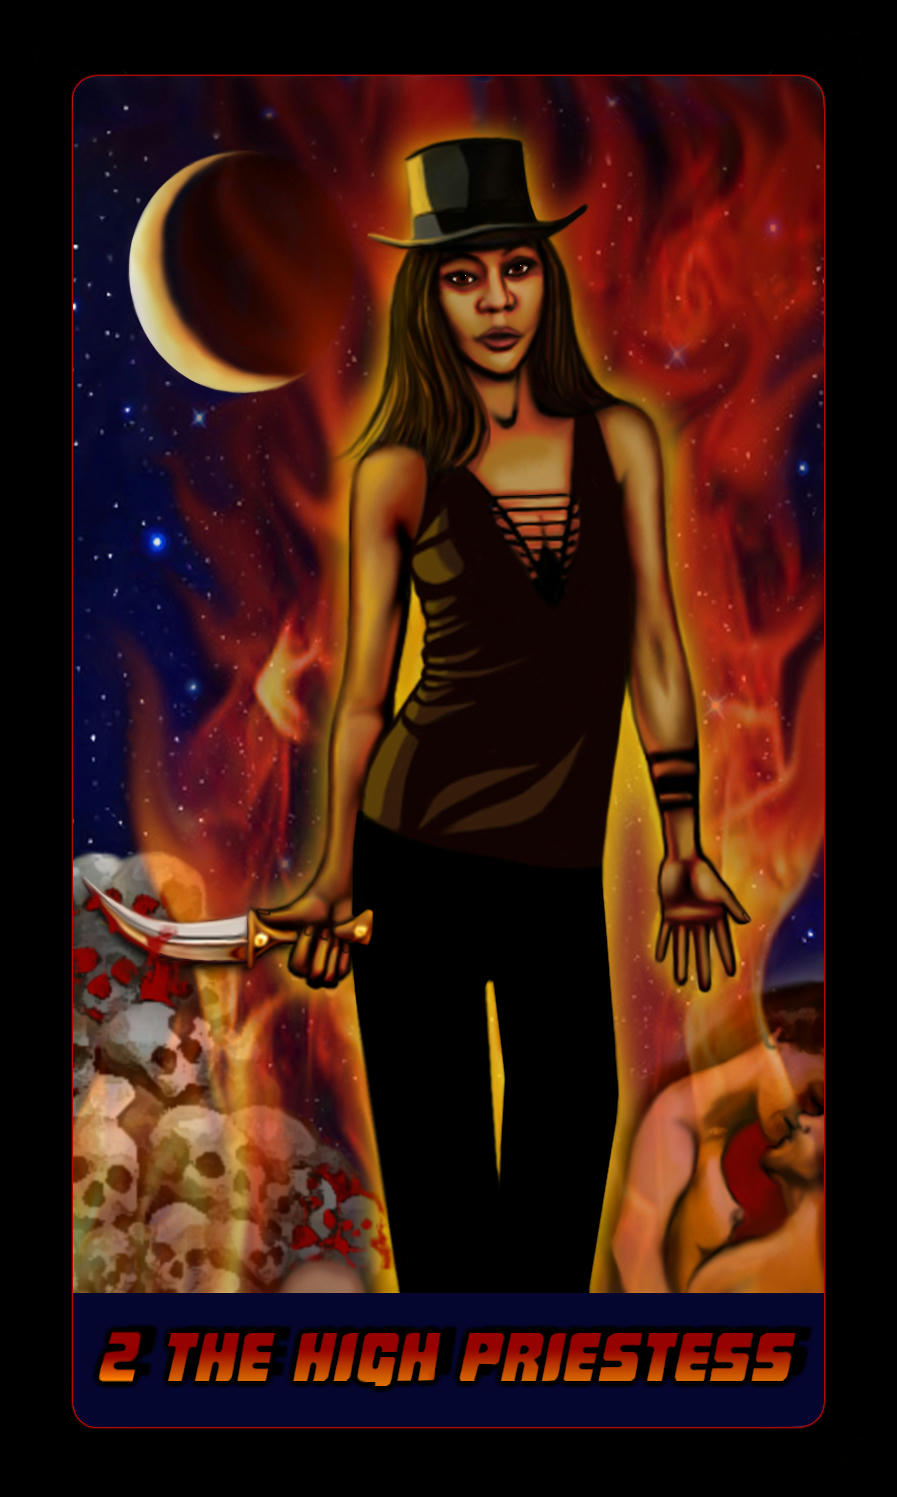 Aisha as the High Priestess - knife, fire, skulls, sex, top hat, moon